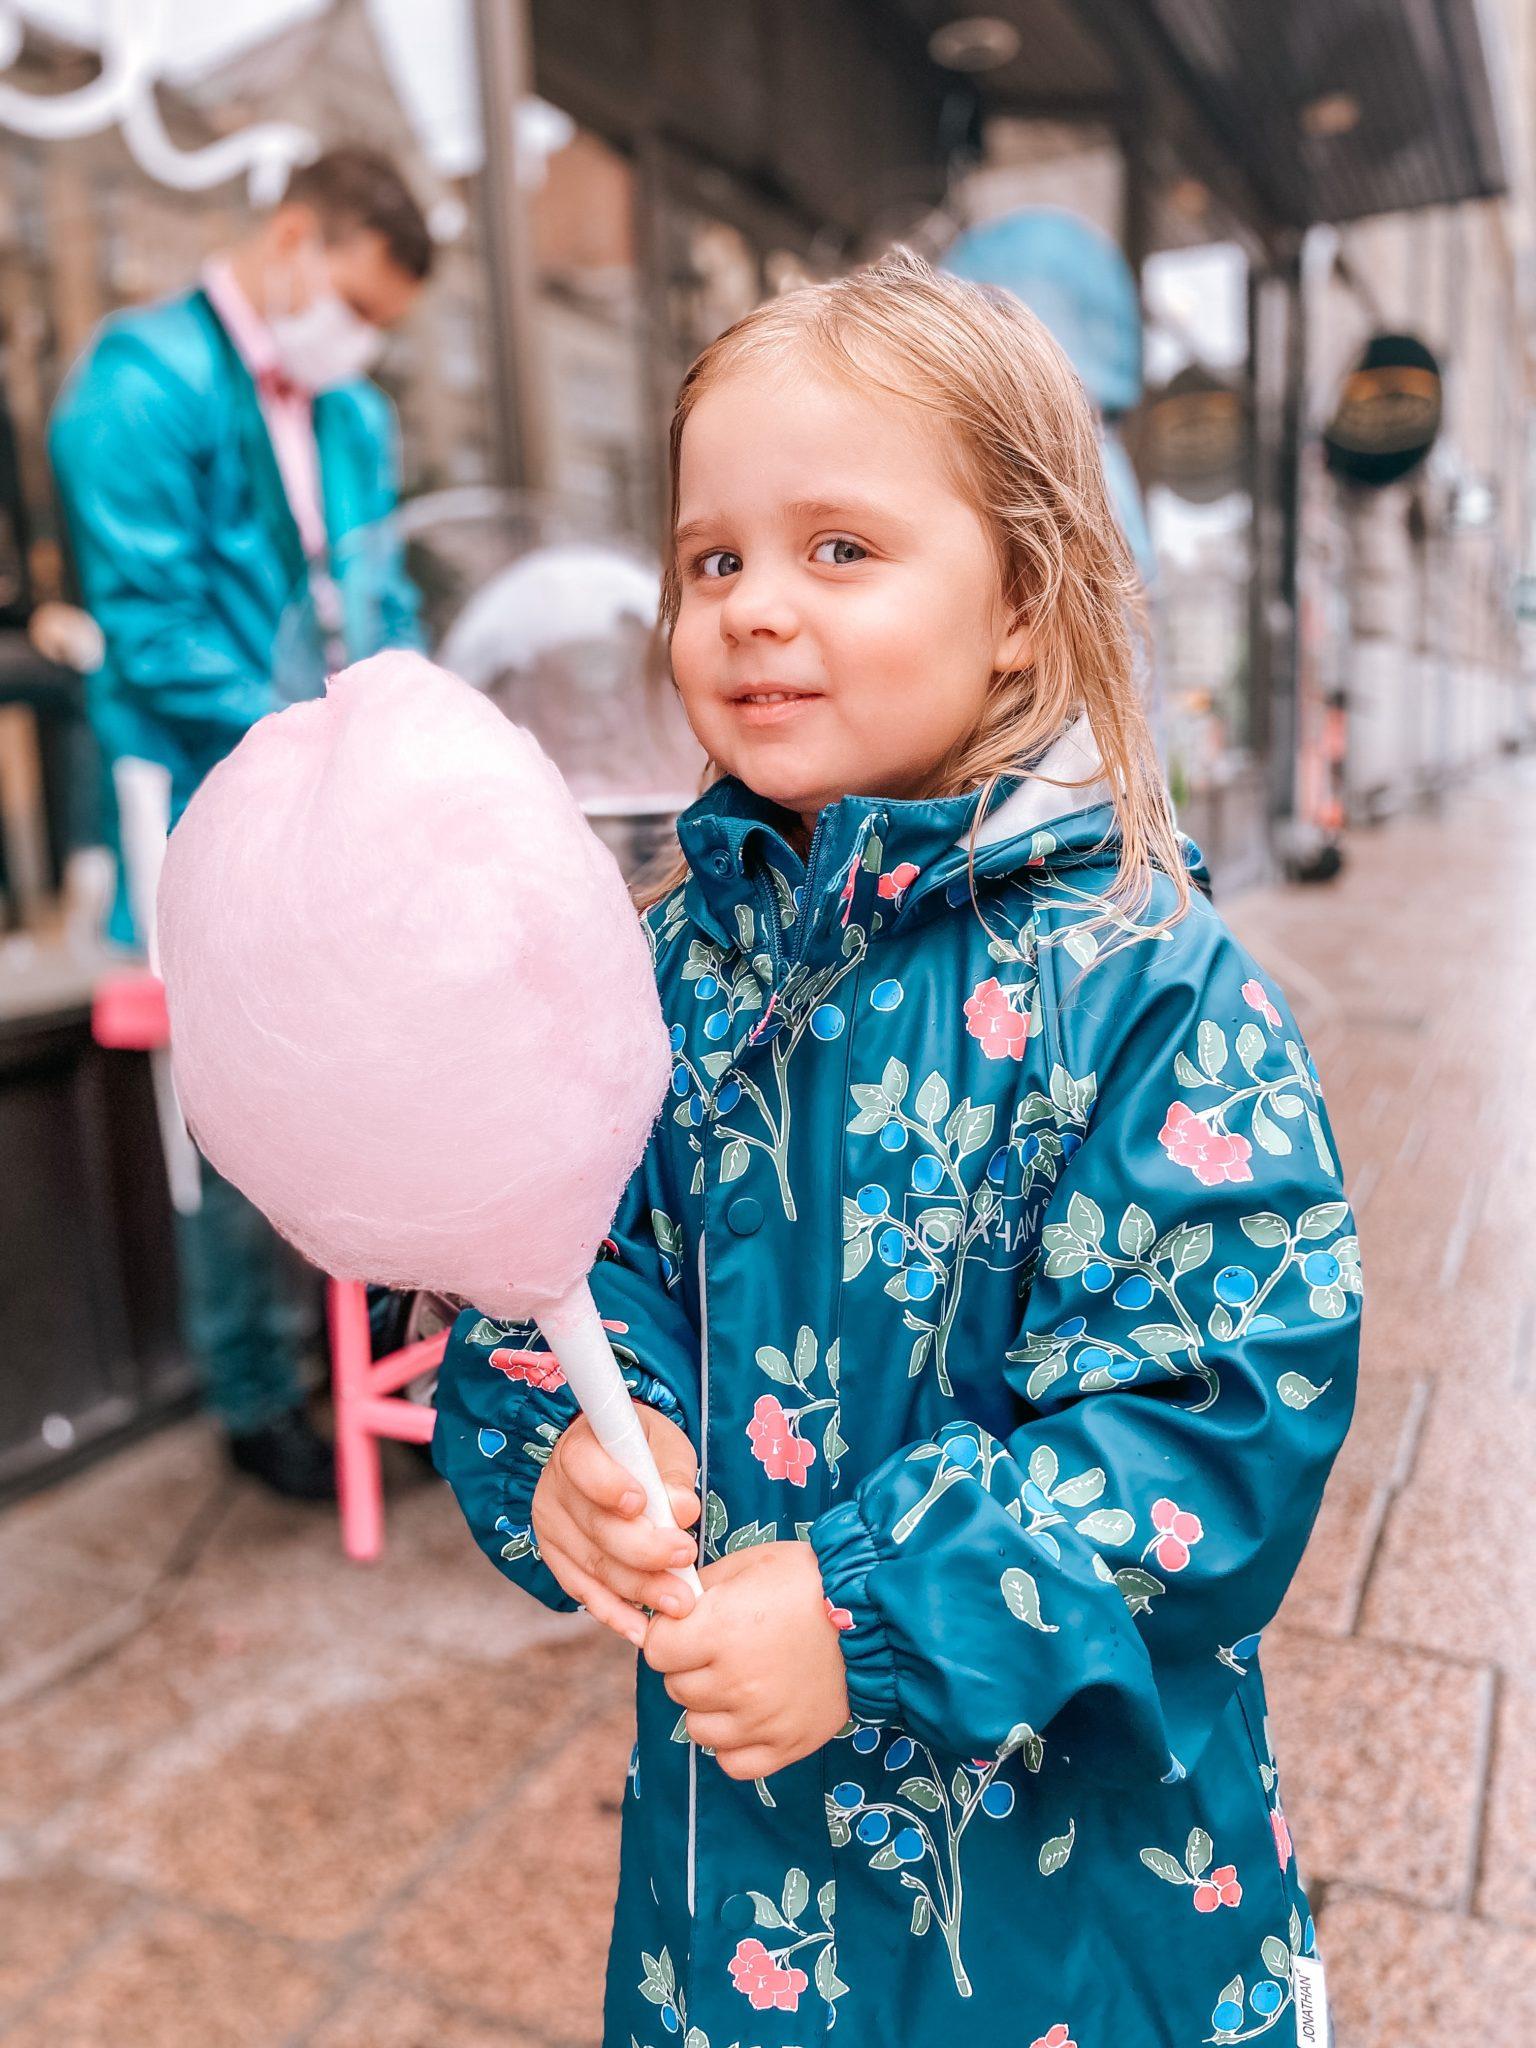 Tampereen pieni lelukauppa